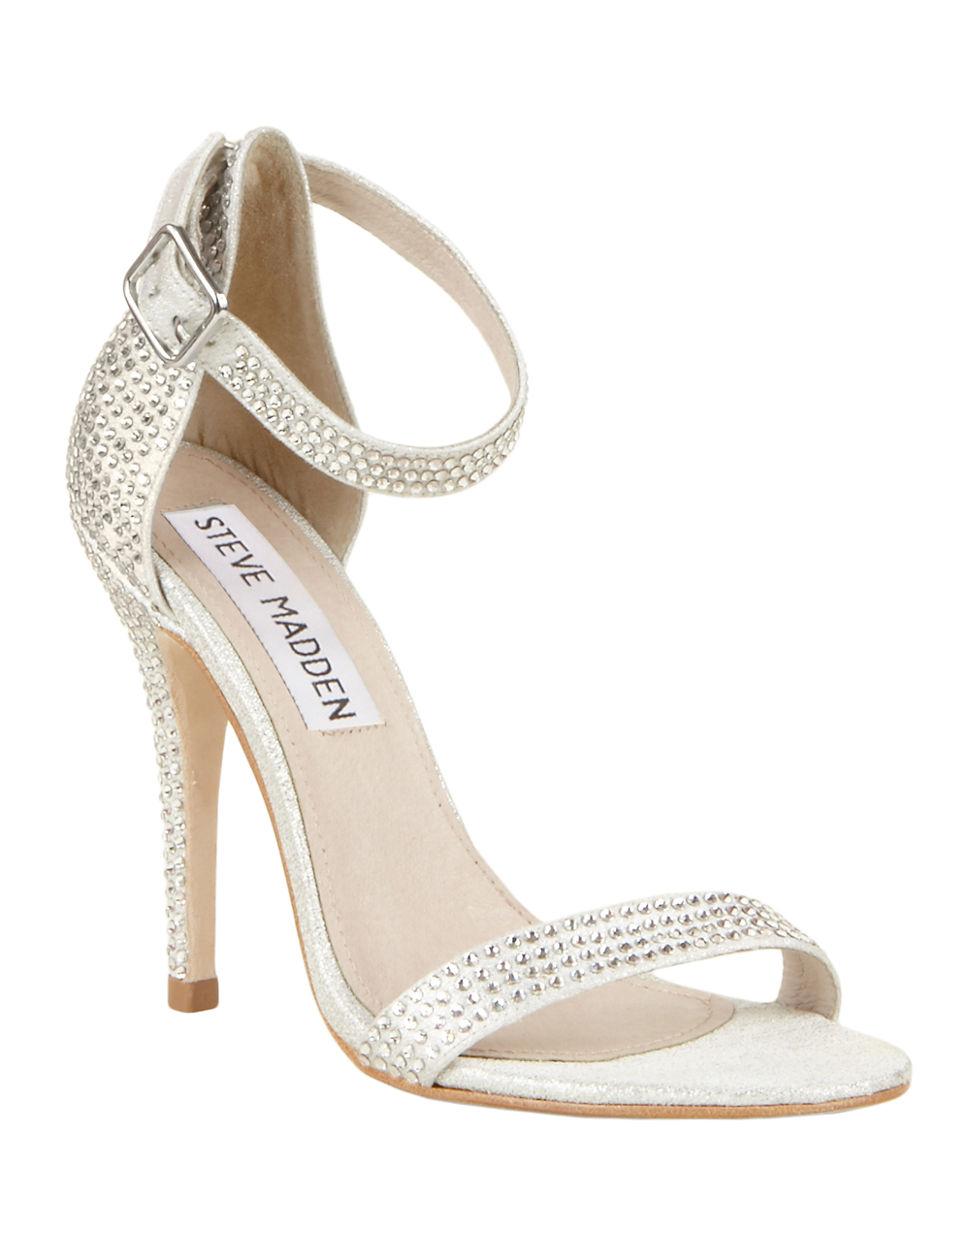 steve madden realov r high heel sandals with rhinestone. Black Bedroom Furniture Sets. Home Design Ideas